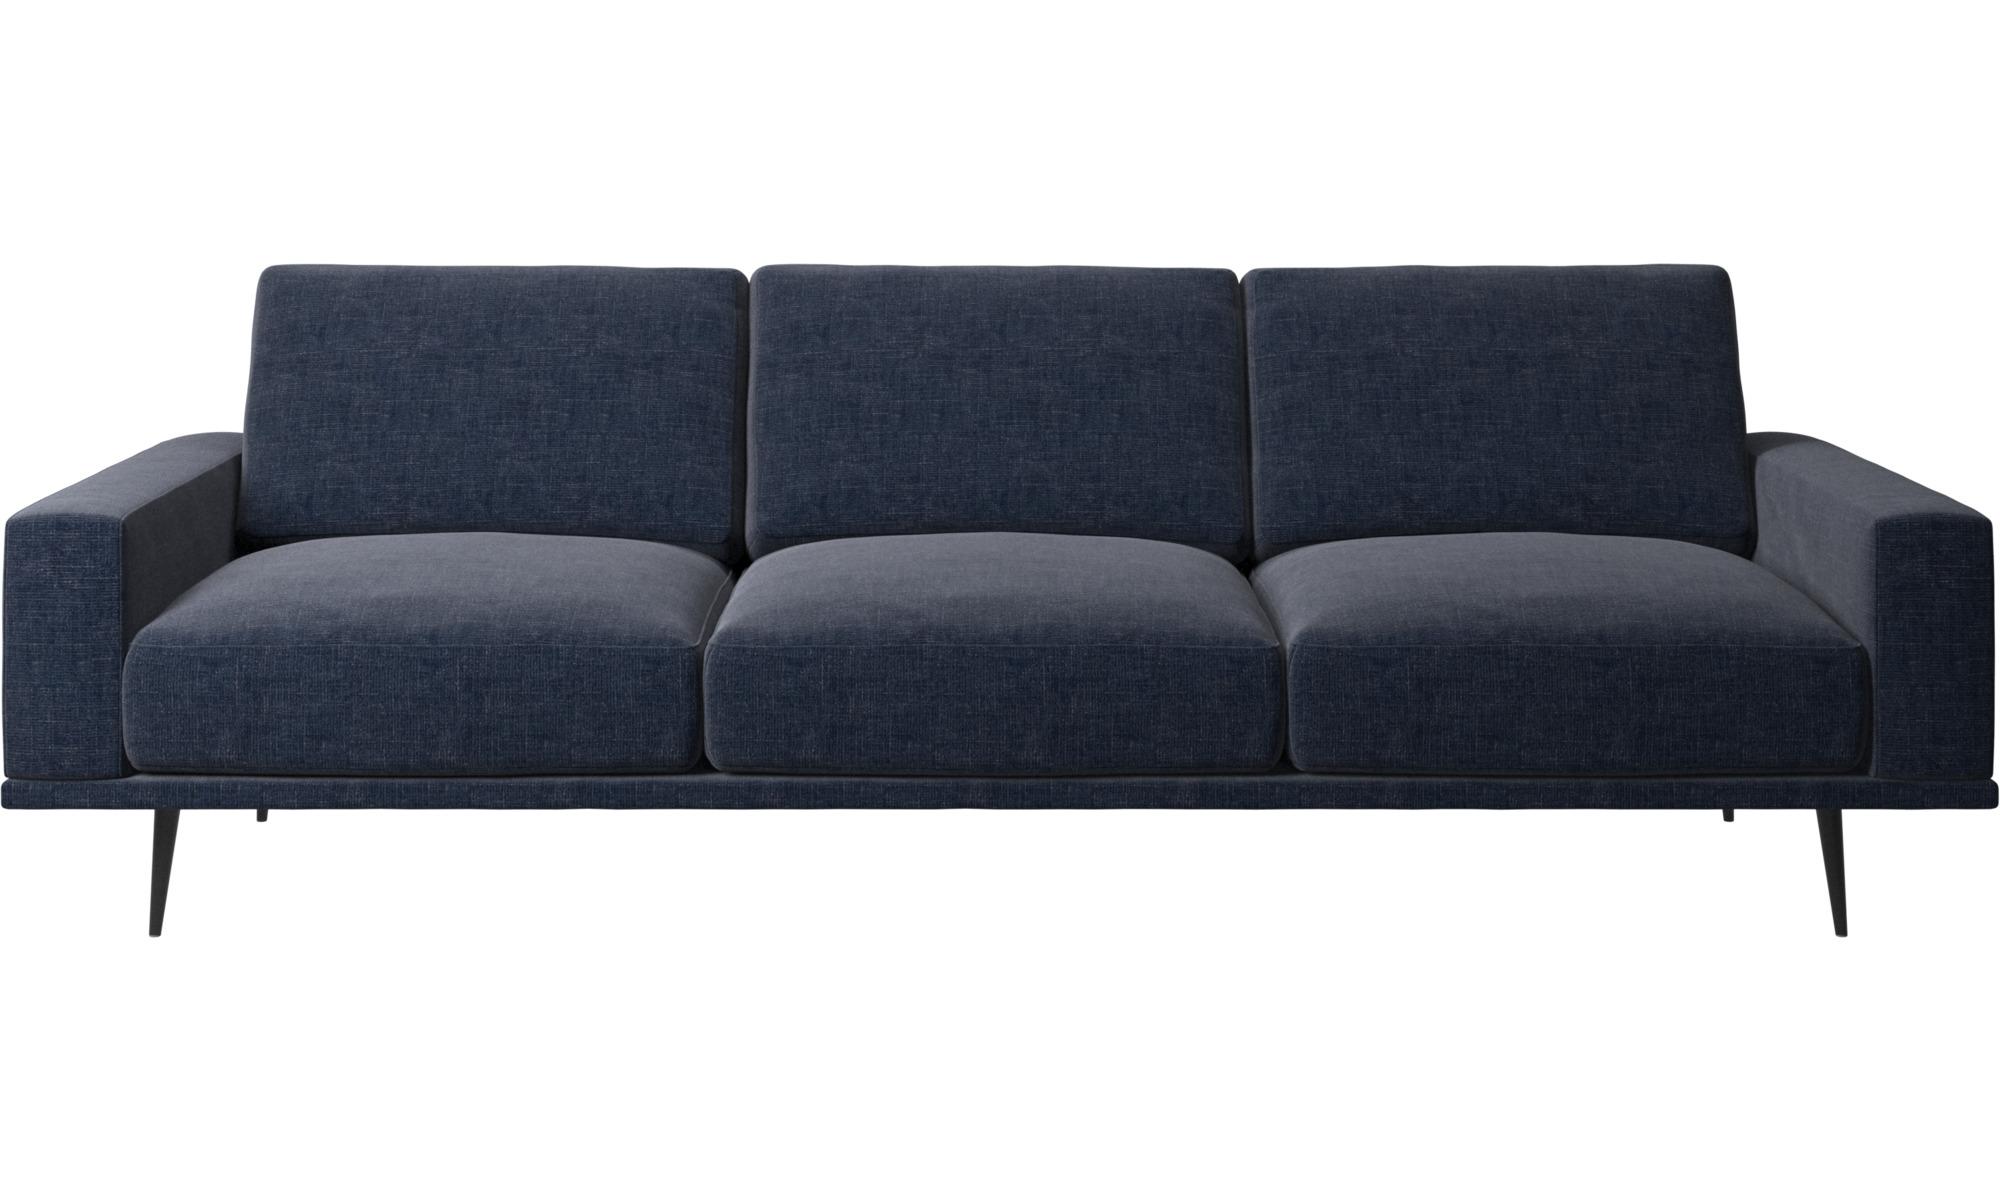 Full Size of 3 Sitzer Sofas Carlton Sofa Boconcept 3er Grau Antik Canape Halbrundes Home Affaire Federkern Englisch Lounge Garten Mit Schlaffunktion Bora Blau Recamiere Sofa Sofa Blau